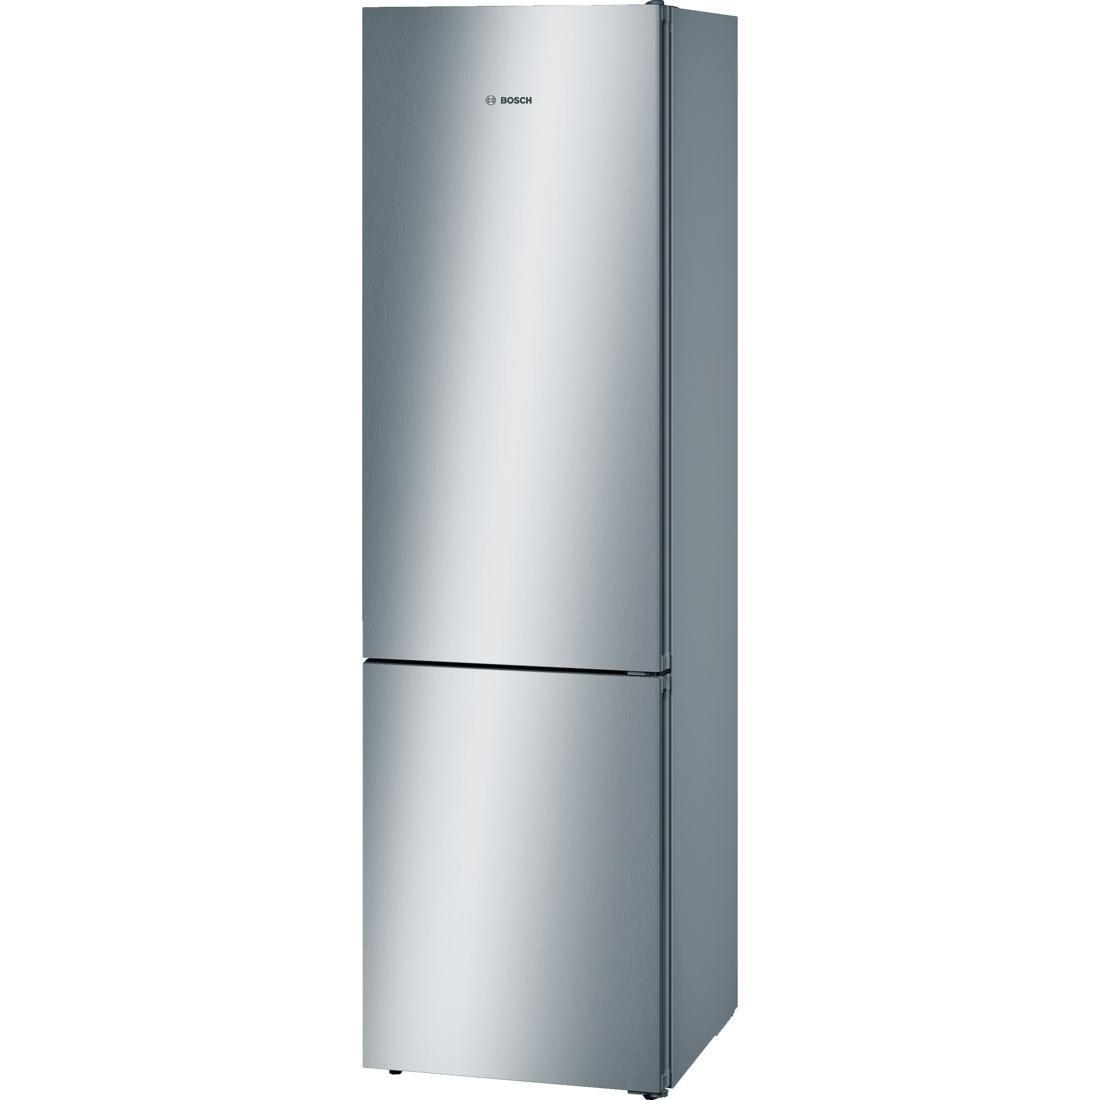 Двухкамерный холодильник Bosch KGN39VL45